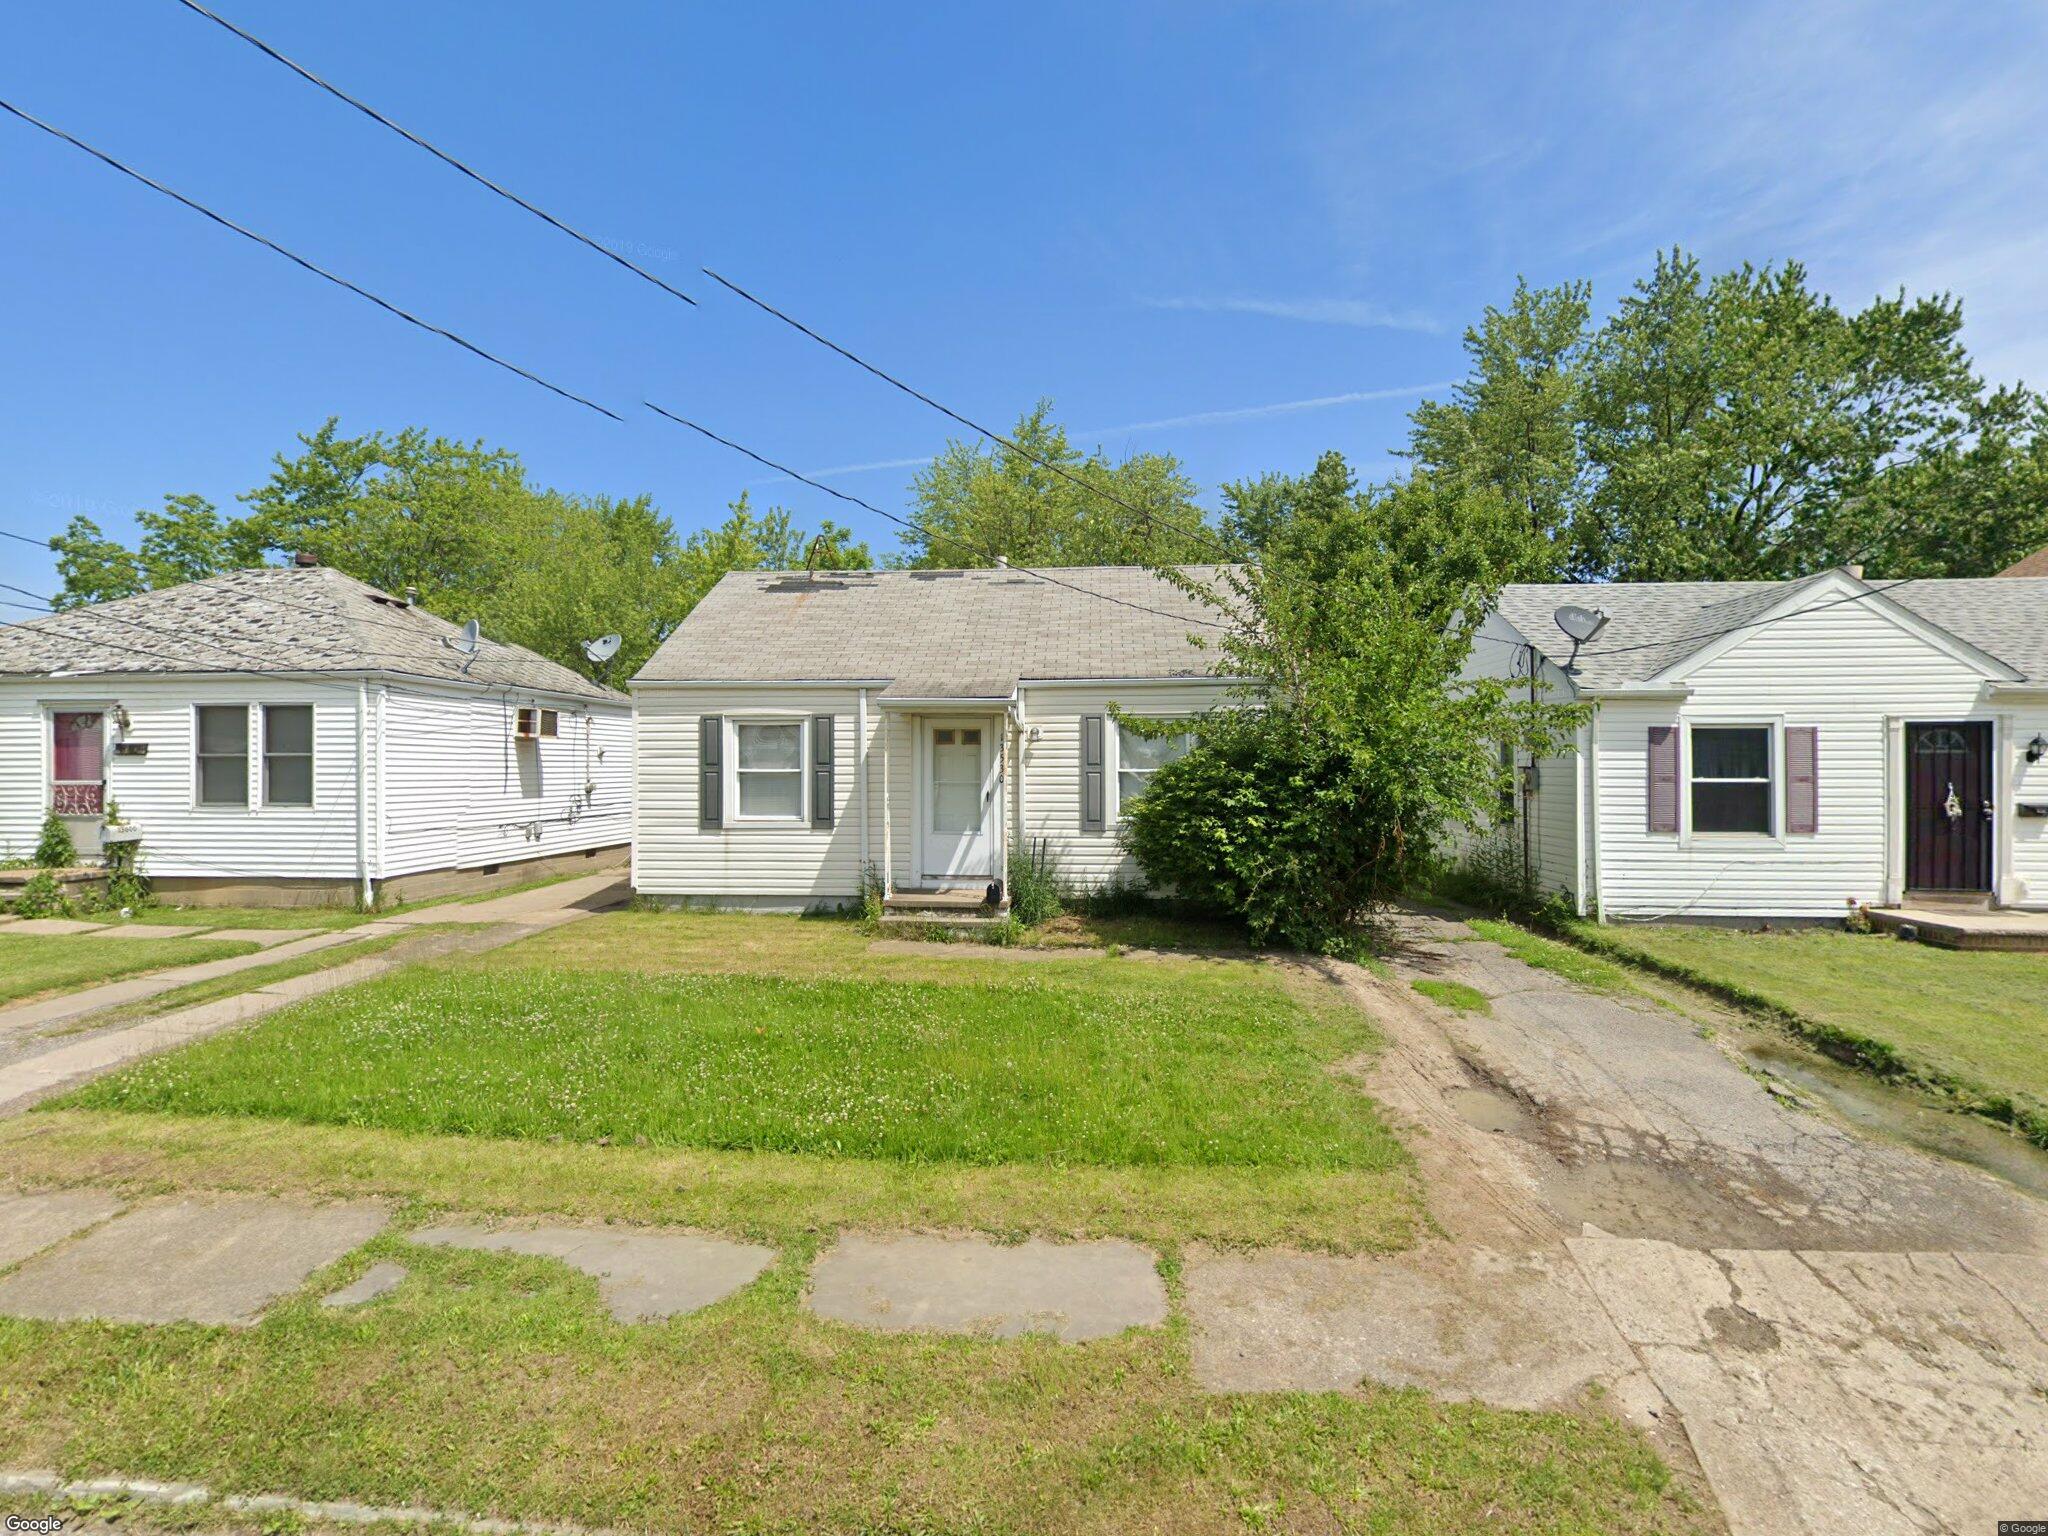 13530 Carrington Ave Cleveland Oh 44135 Foreclosure Trulia